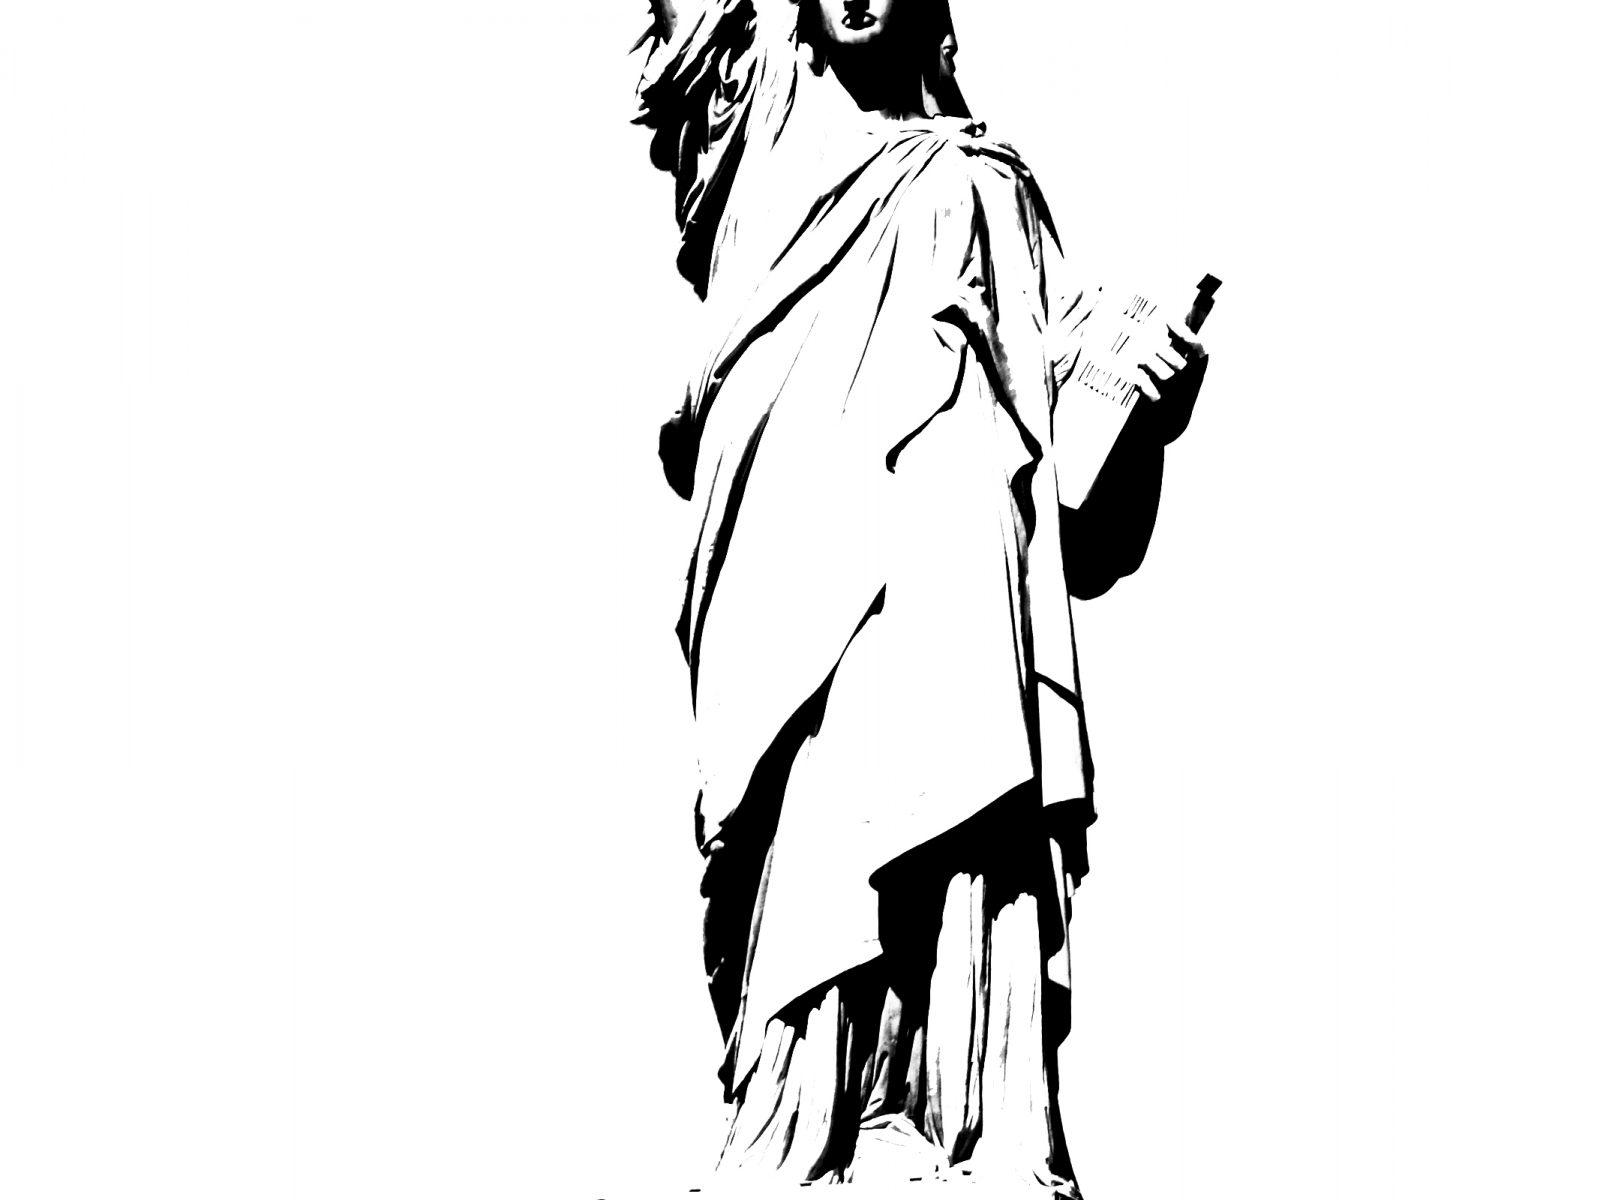 1600x1200 Statue Of Liberty Pencil Sketch Drawing Impressiveree Download